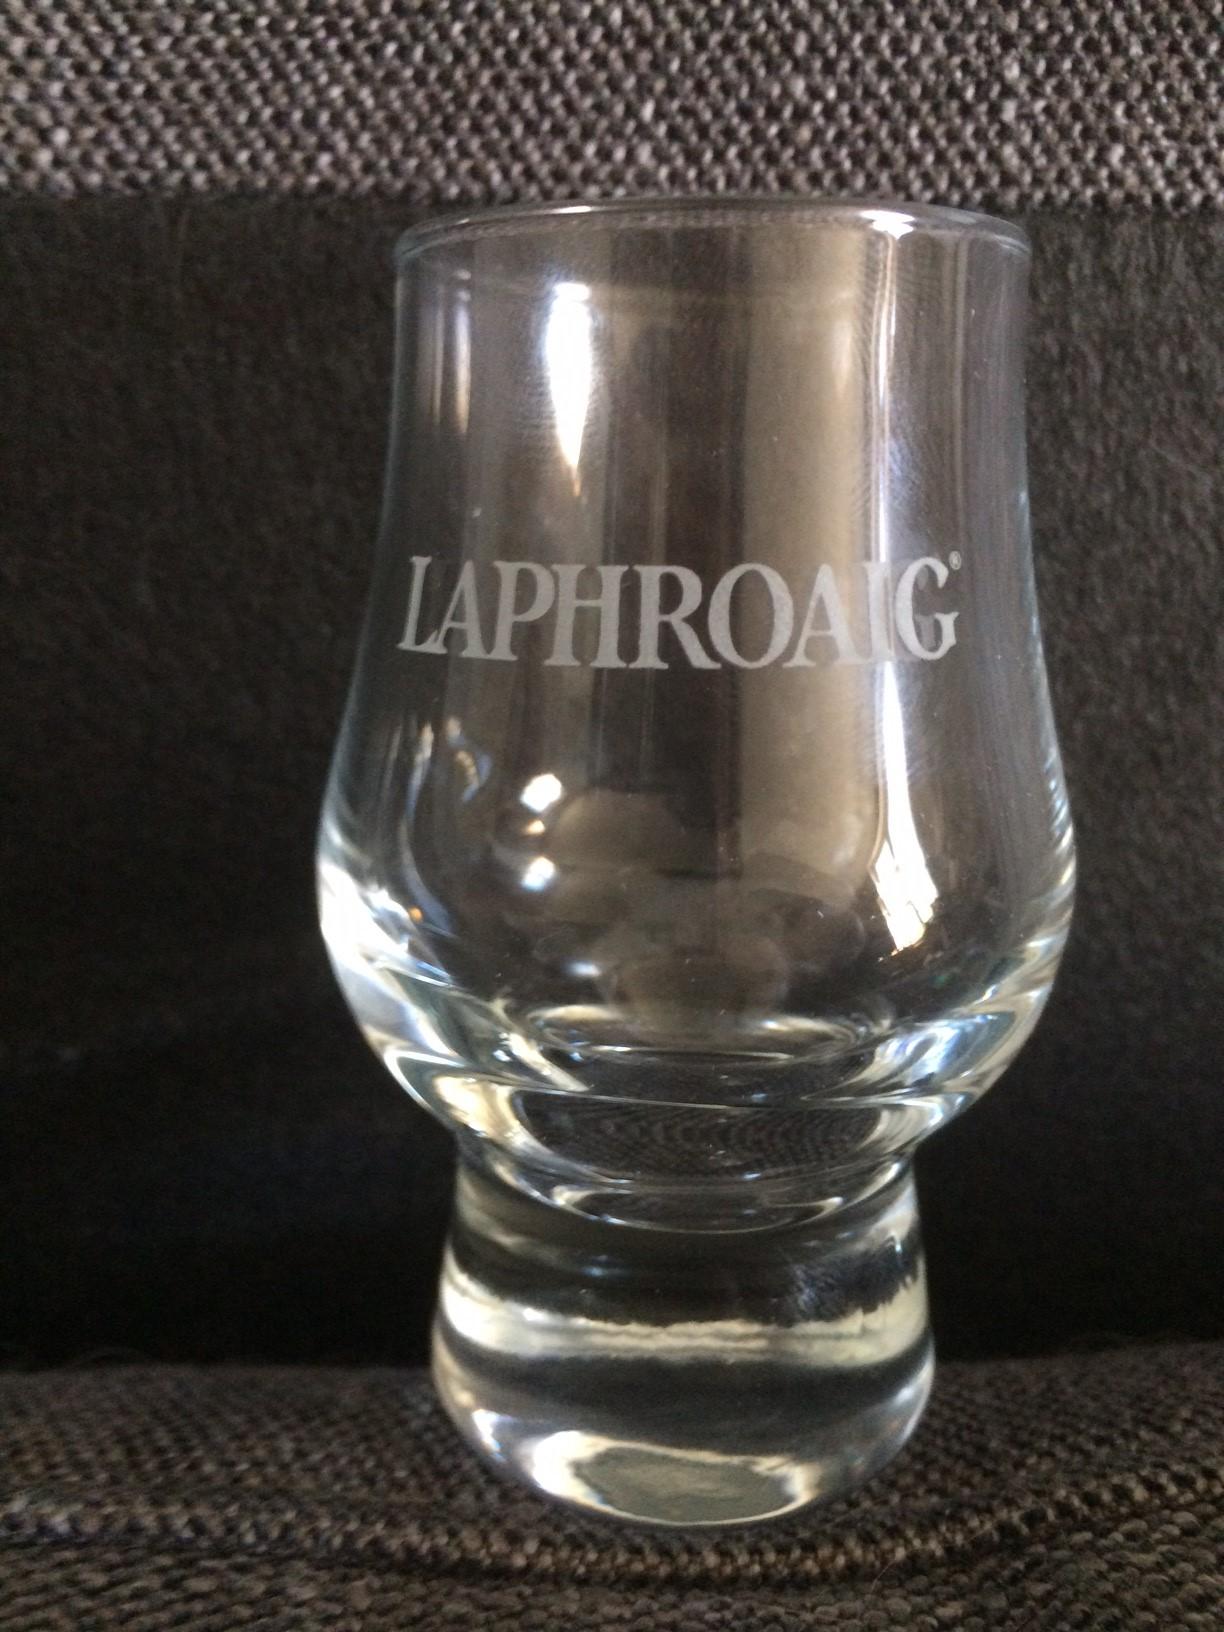 John Campbell - Distillery Manager Laphroaig - WHISKYTOWER 66ce8fbea